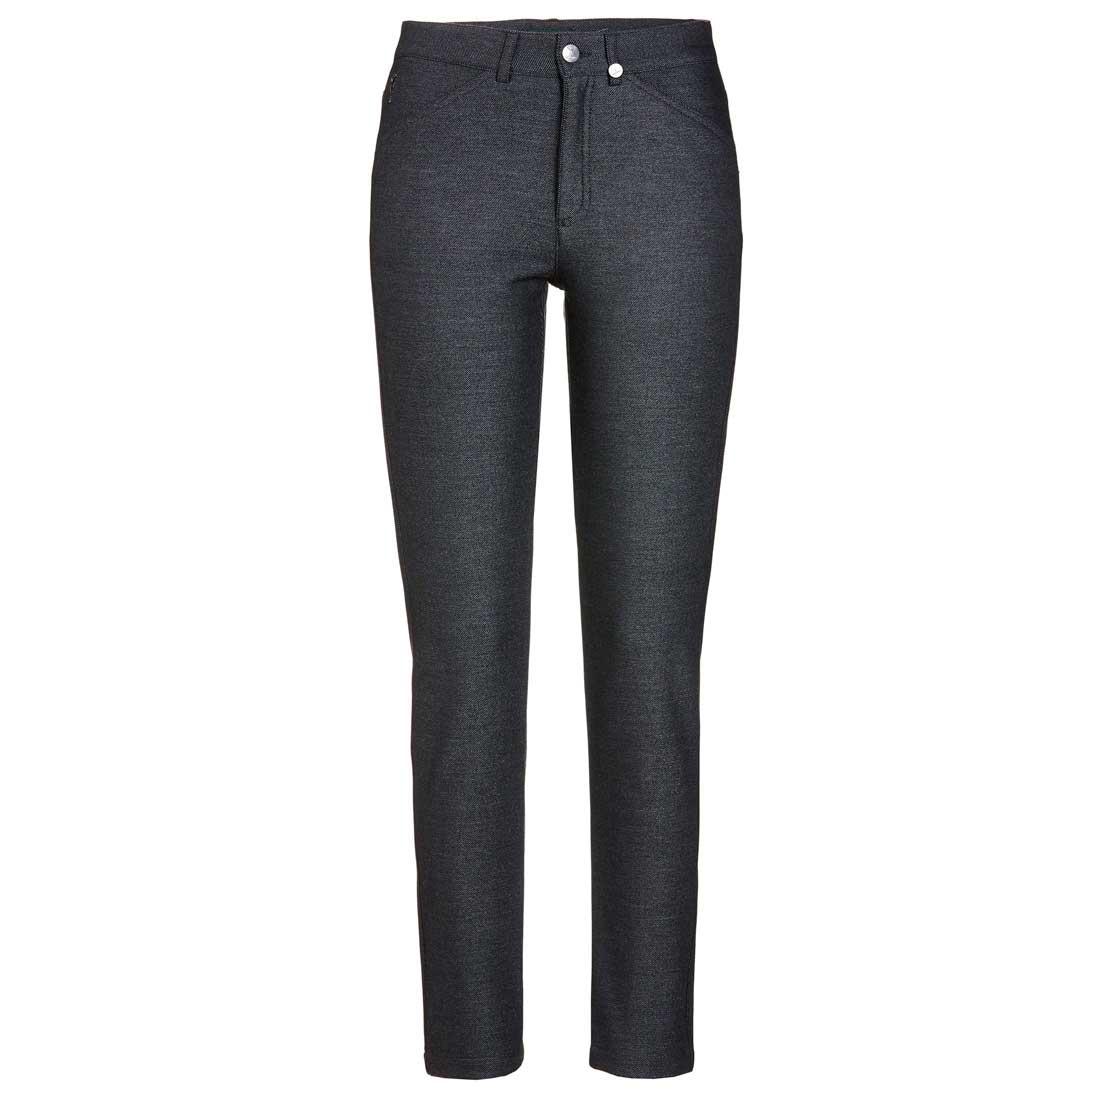 Pantalón de golf elástico 7/8 Tech Tweed de mujer con Cold Protection